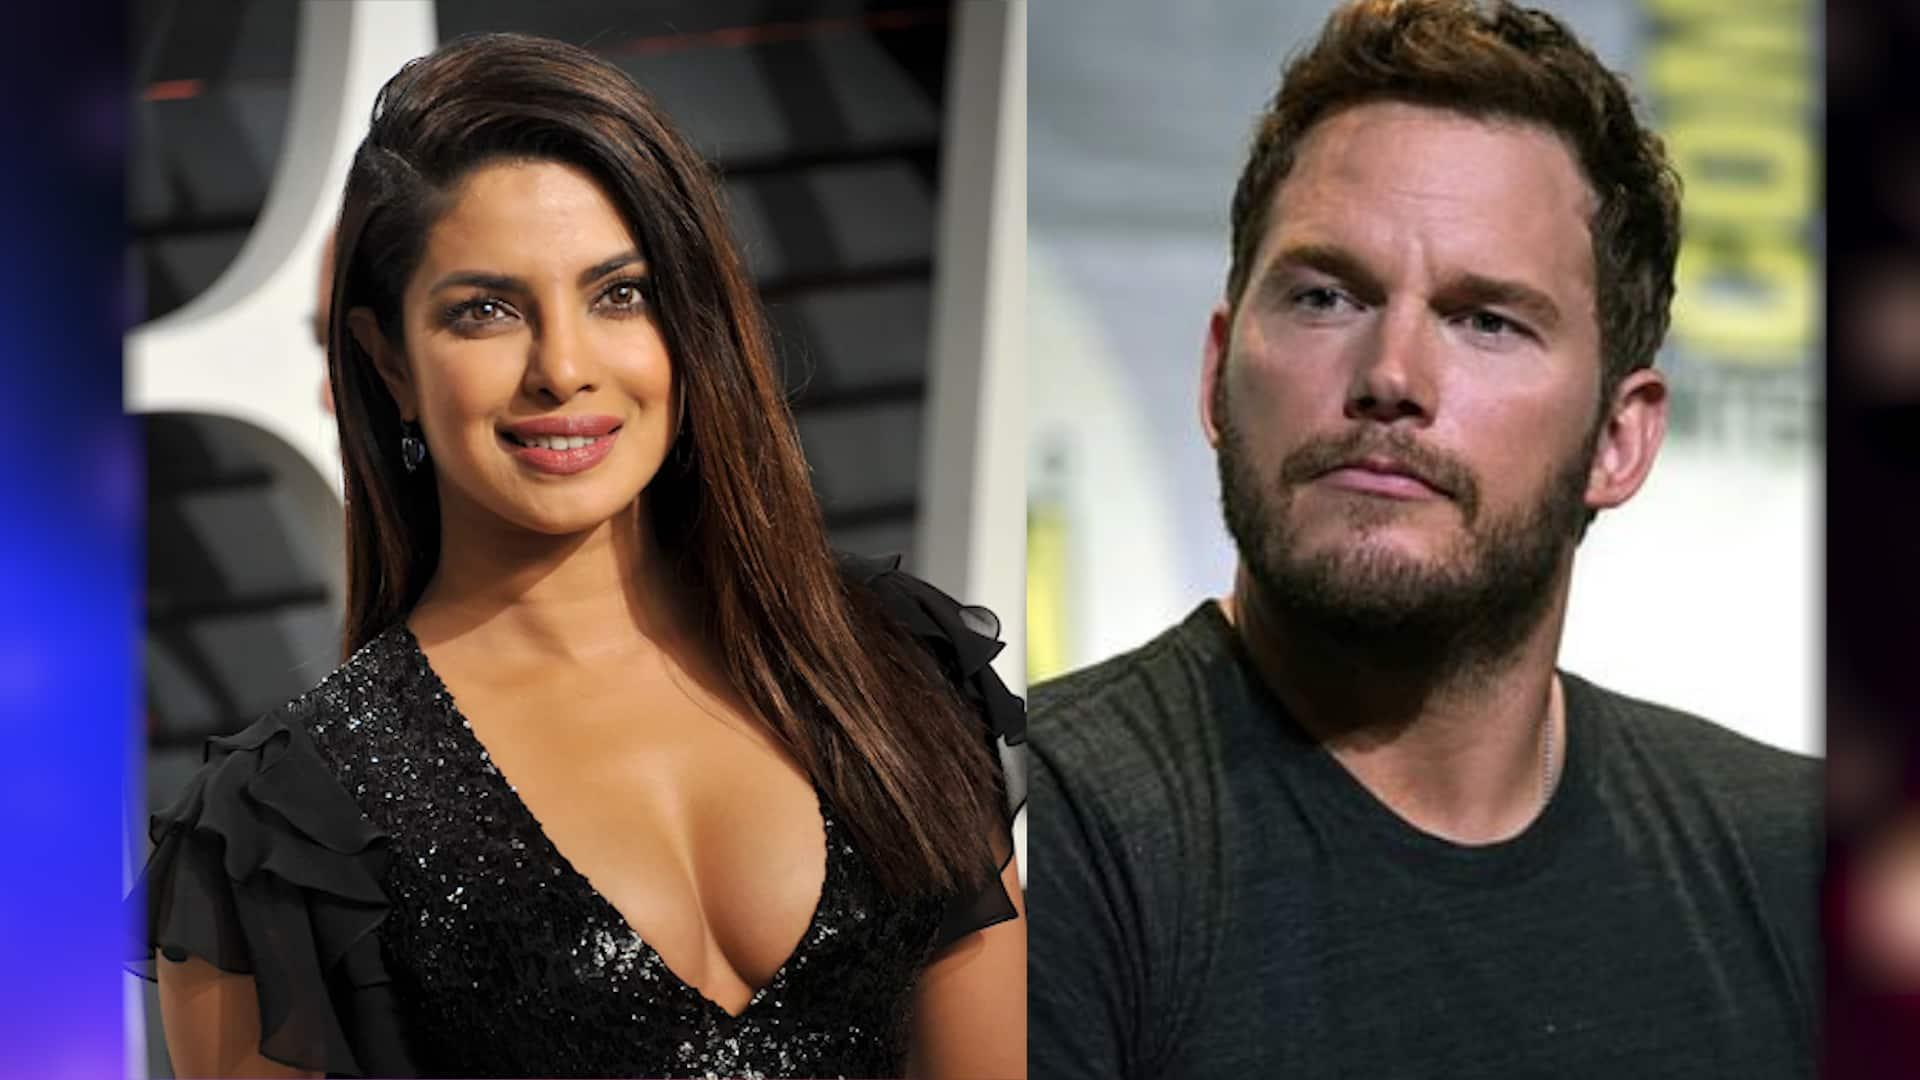 Priyanka Chopra to romance Chris Pratt in Cowboy Ninja Viking